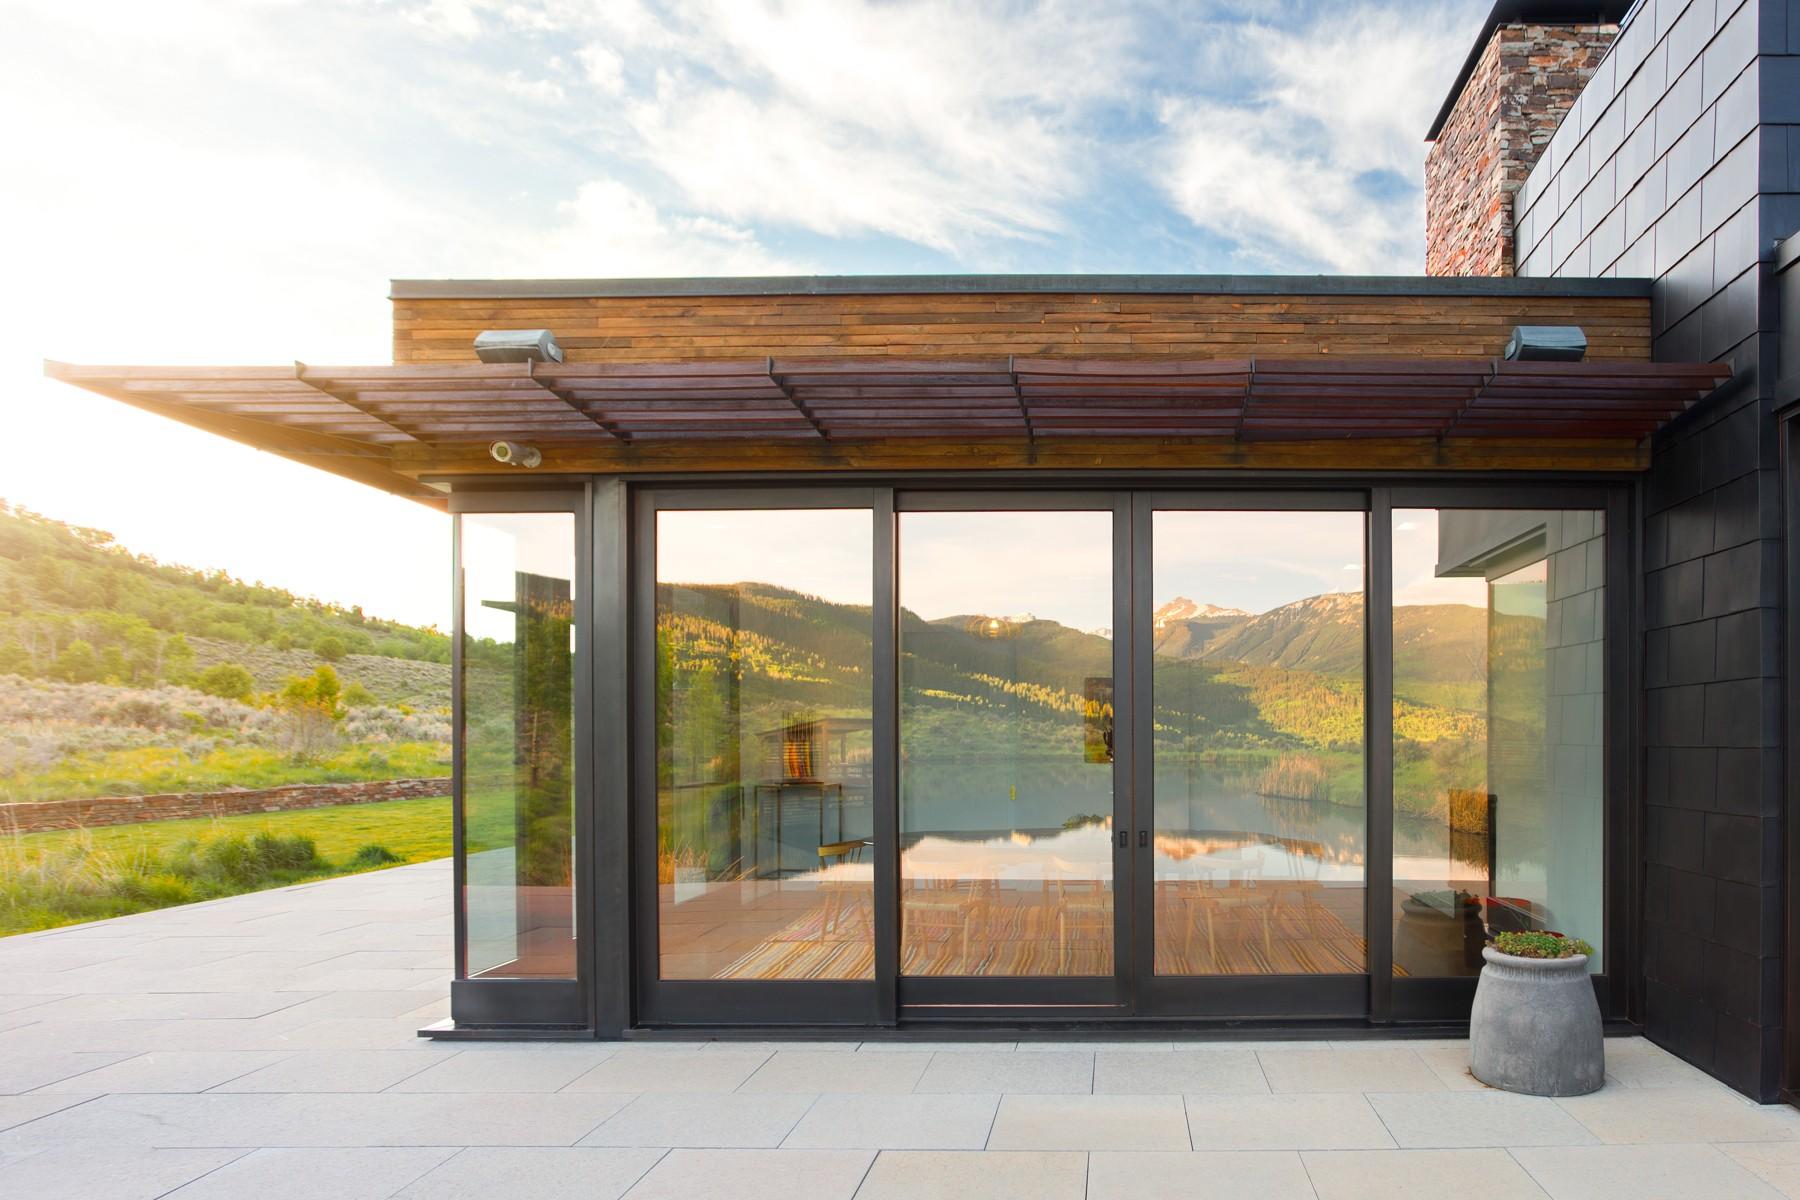 Additional photo for property listing at WALDEN HOUSE 705 Whiskey Ridge Edwards, Colorado 81632 United States